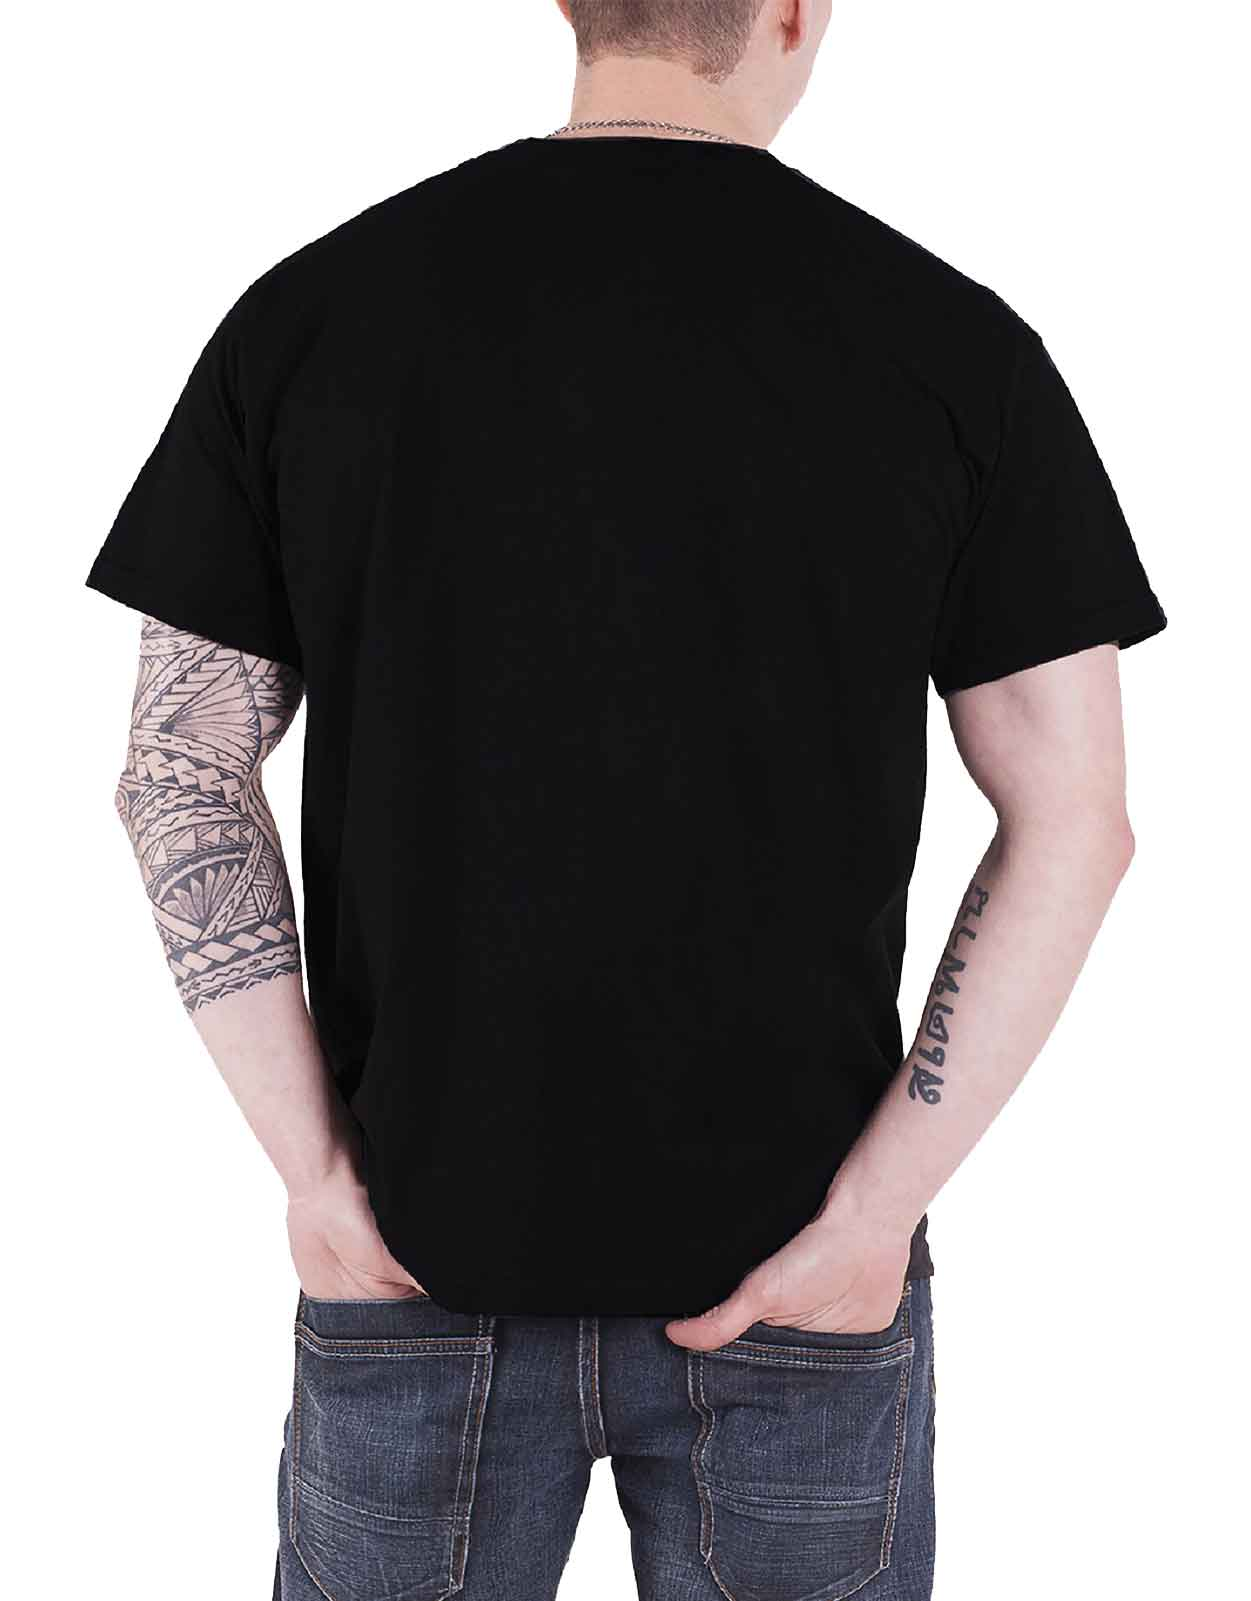 Official-Motley-Crue-T-Shirt-Shout-at-the-Devil-The-Dirt-Tour-Band-Logo-Mens thumbnail 9